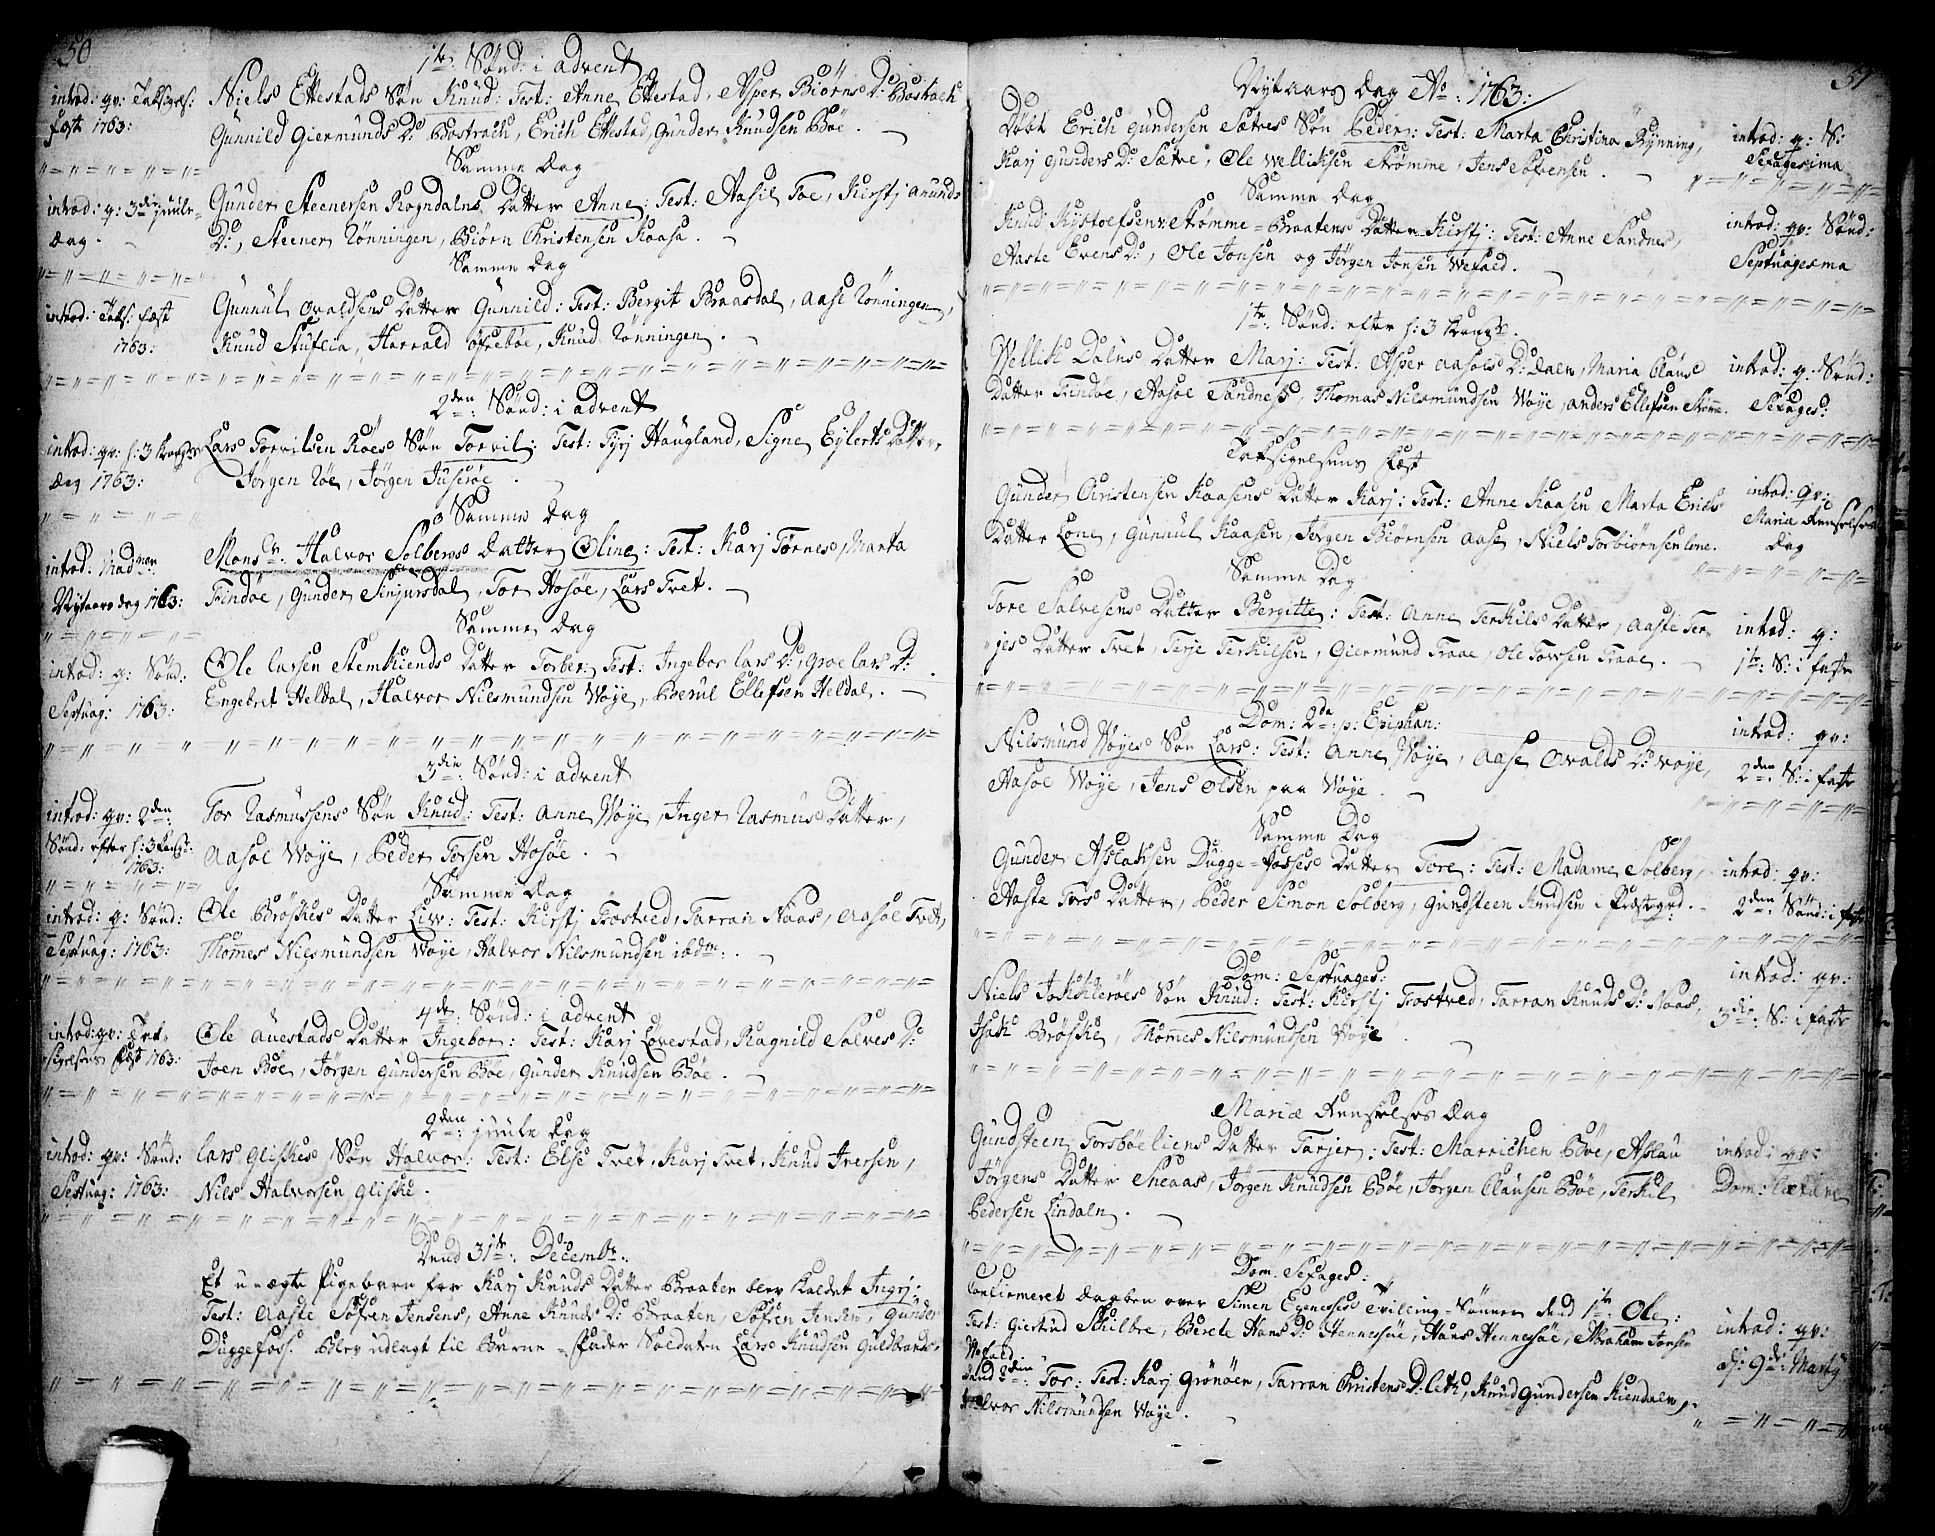 SAKO, Drangedal kirkebøker, F/Fa/L0001: Ministerialbok nr. 1, 1697-1767, s. 50-51